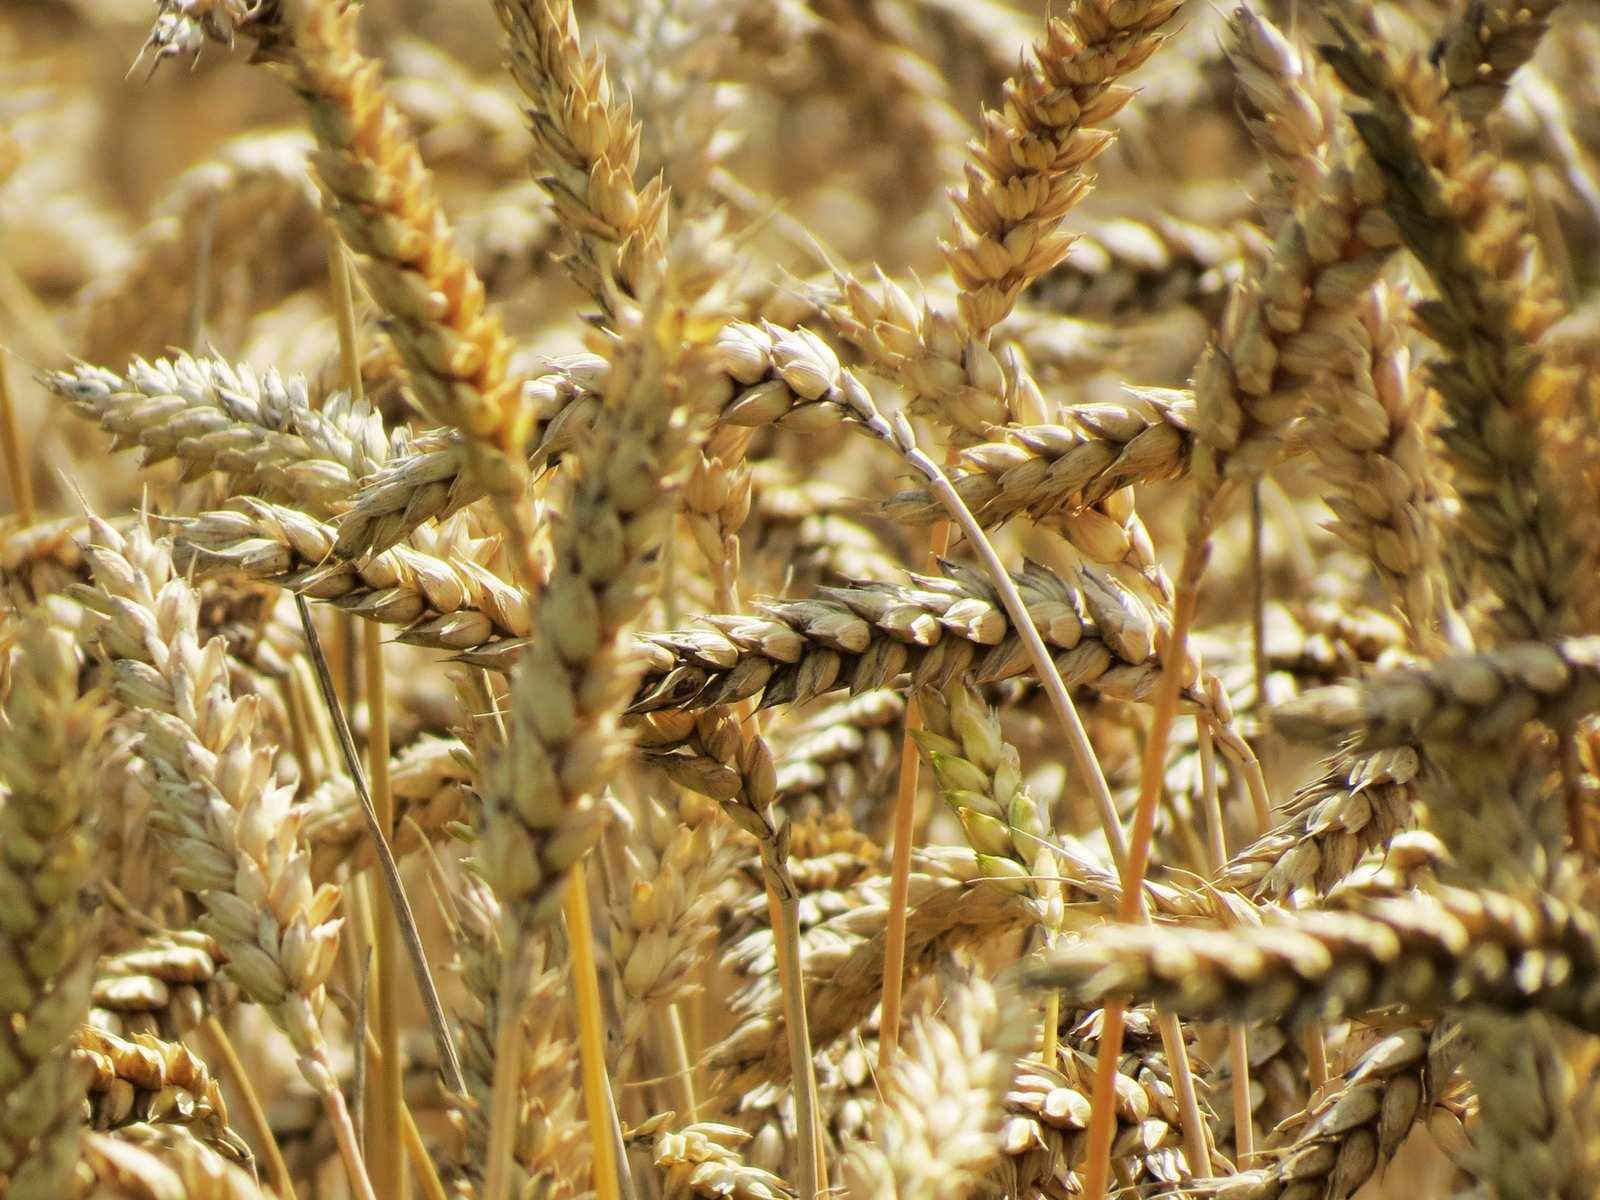 Curs Managementul exploatatiilor agricole